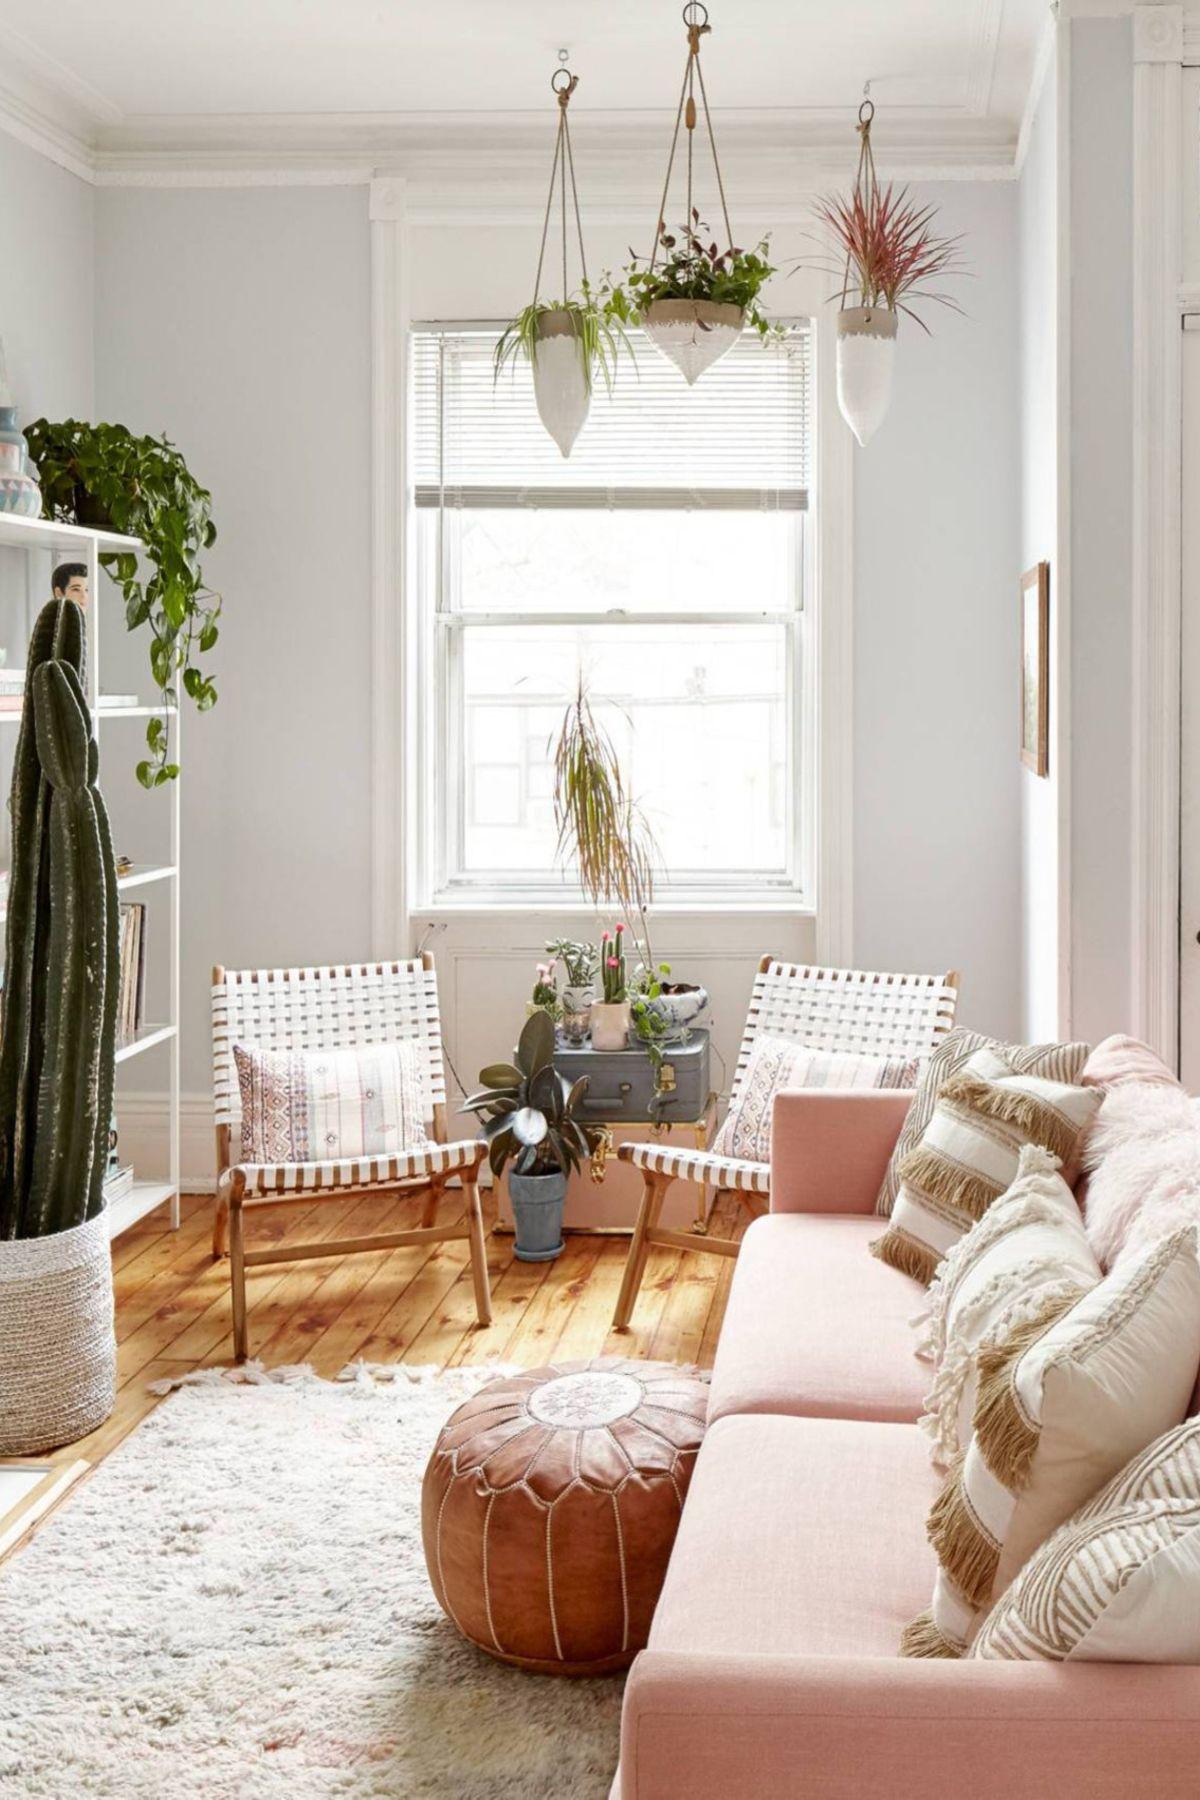 51 Bohemian Chic Living Room Decor Ideas Boho Chic Living Room